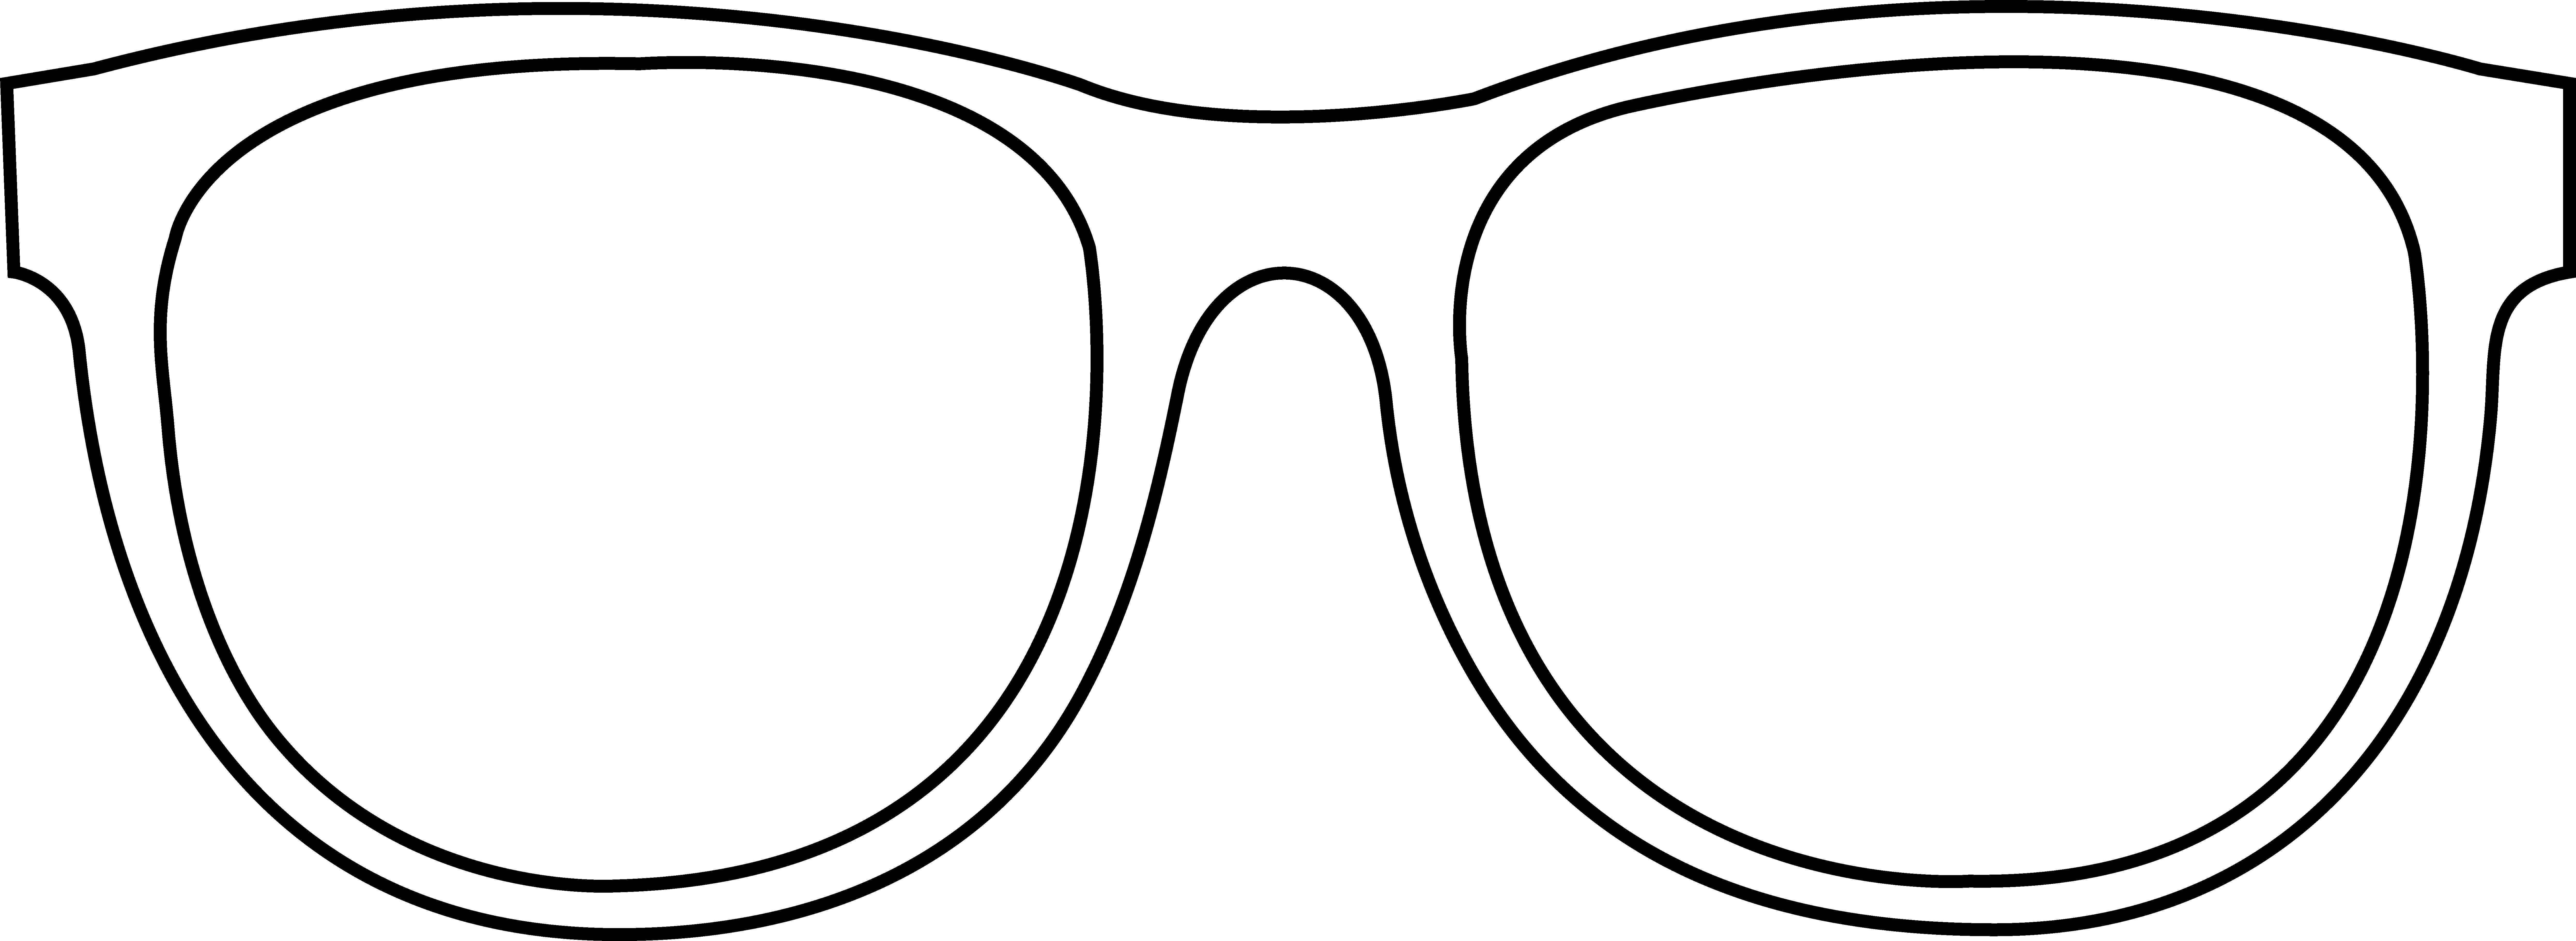 Line Drawing Glasses : Nerd glasses clipart panda free images